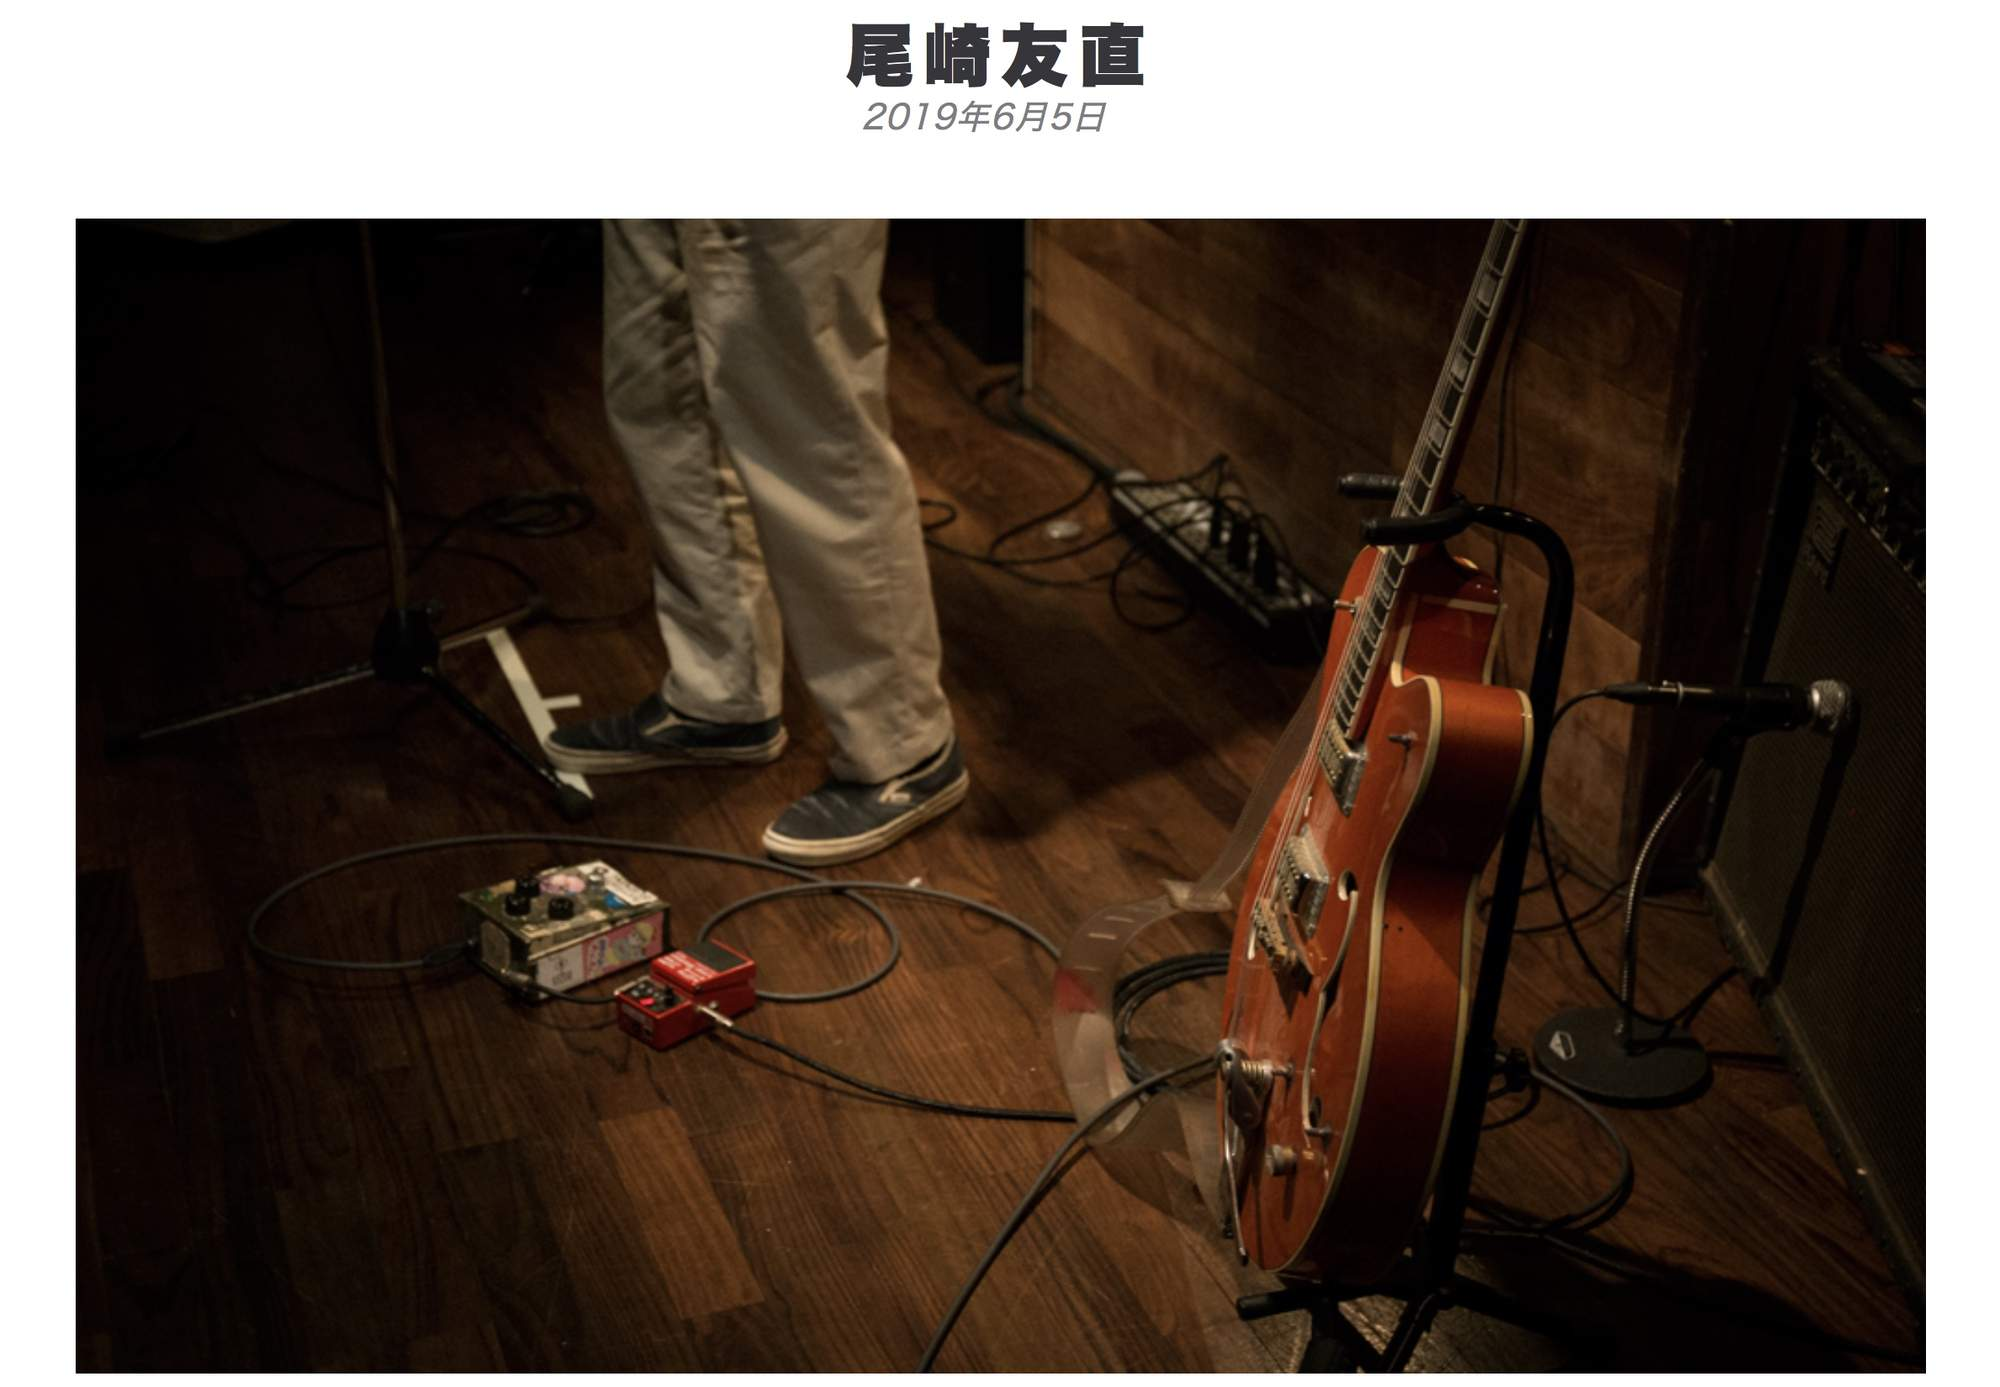 http://rose-records.jp/files/20190611134027.jpg